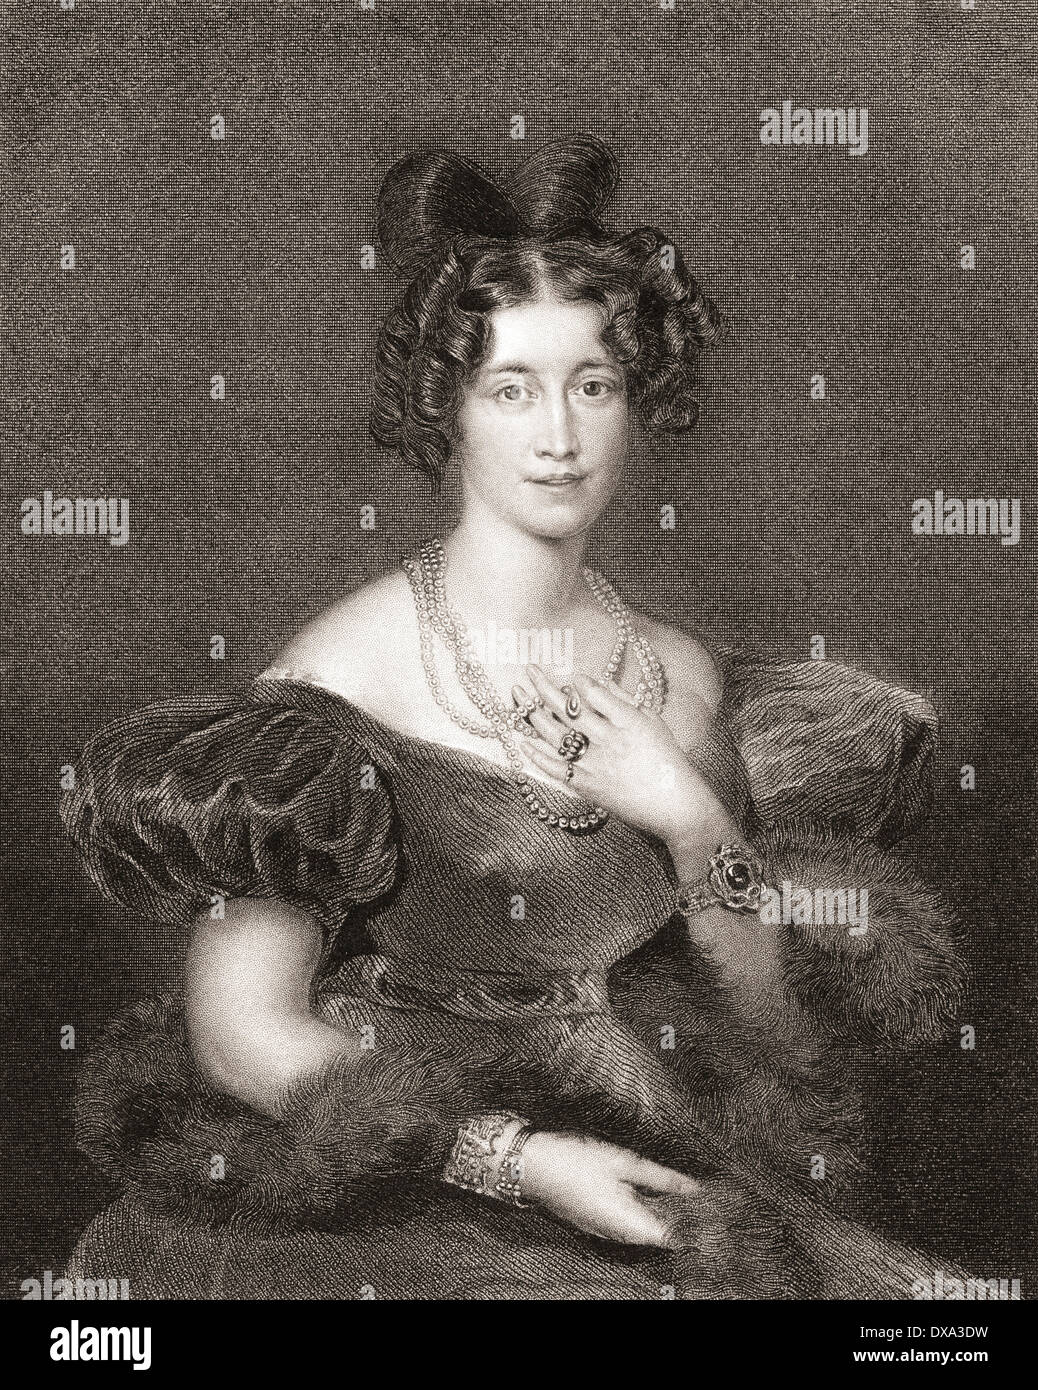 Sophia Sidney, Baroness De L'Isle and Dudley, née FitzClarence, 1796 –1837. Eldest daughter of William IV and Dorothea Jordan. - Stock Image